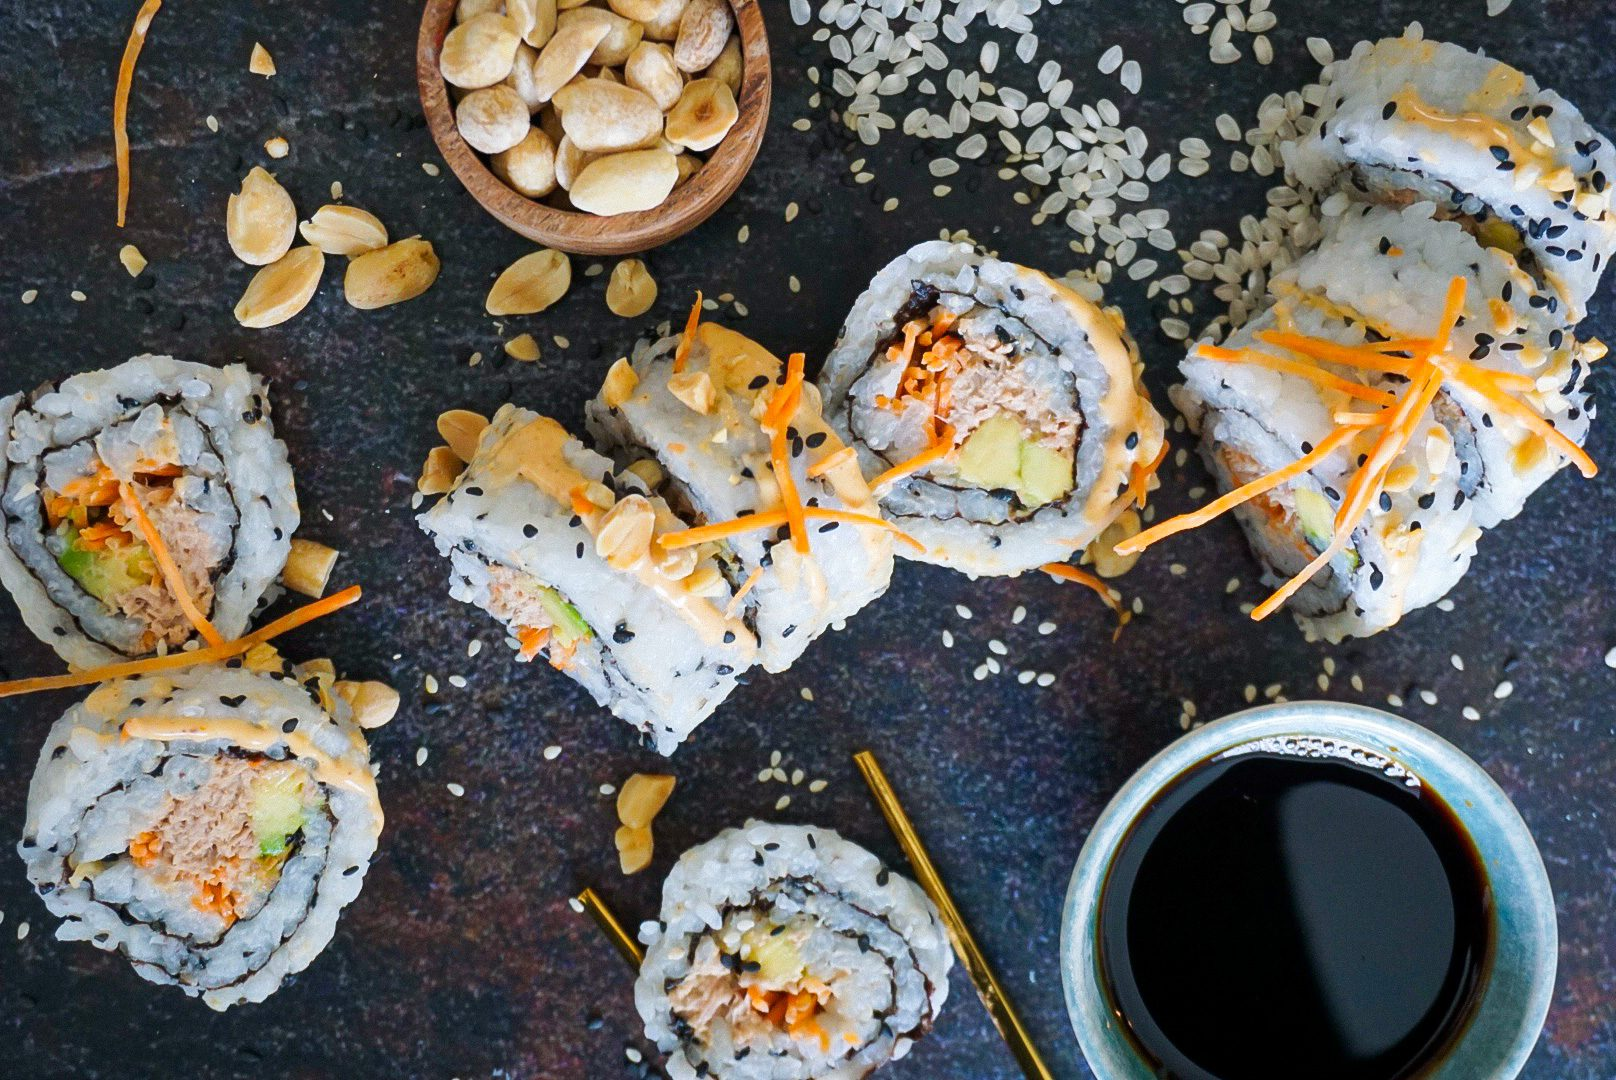 Sushirol met pittige tonijn en stukjes pinda